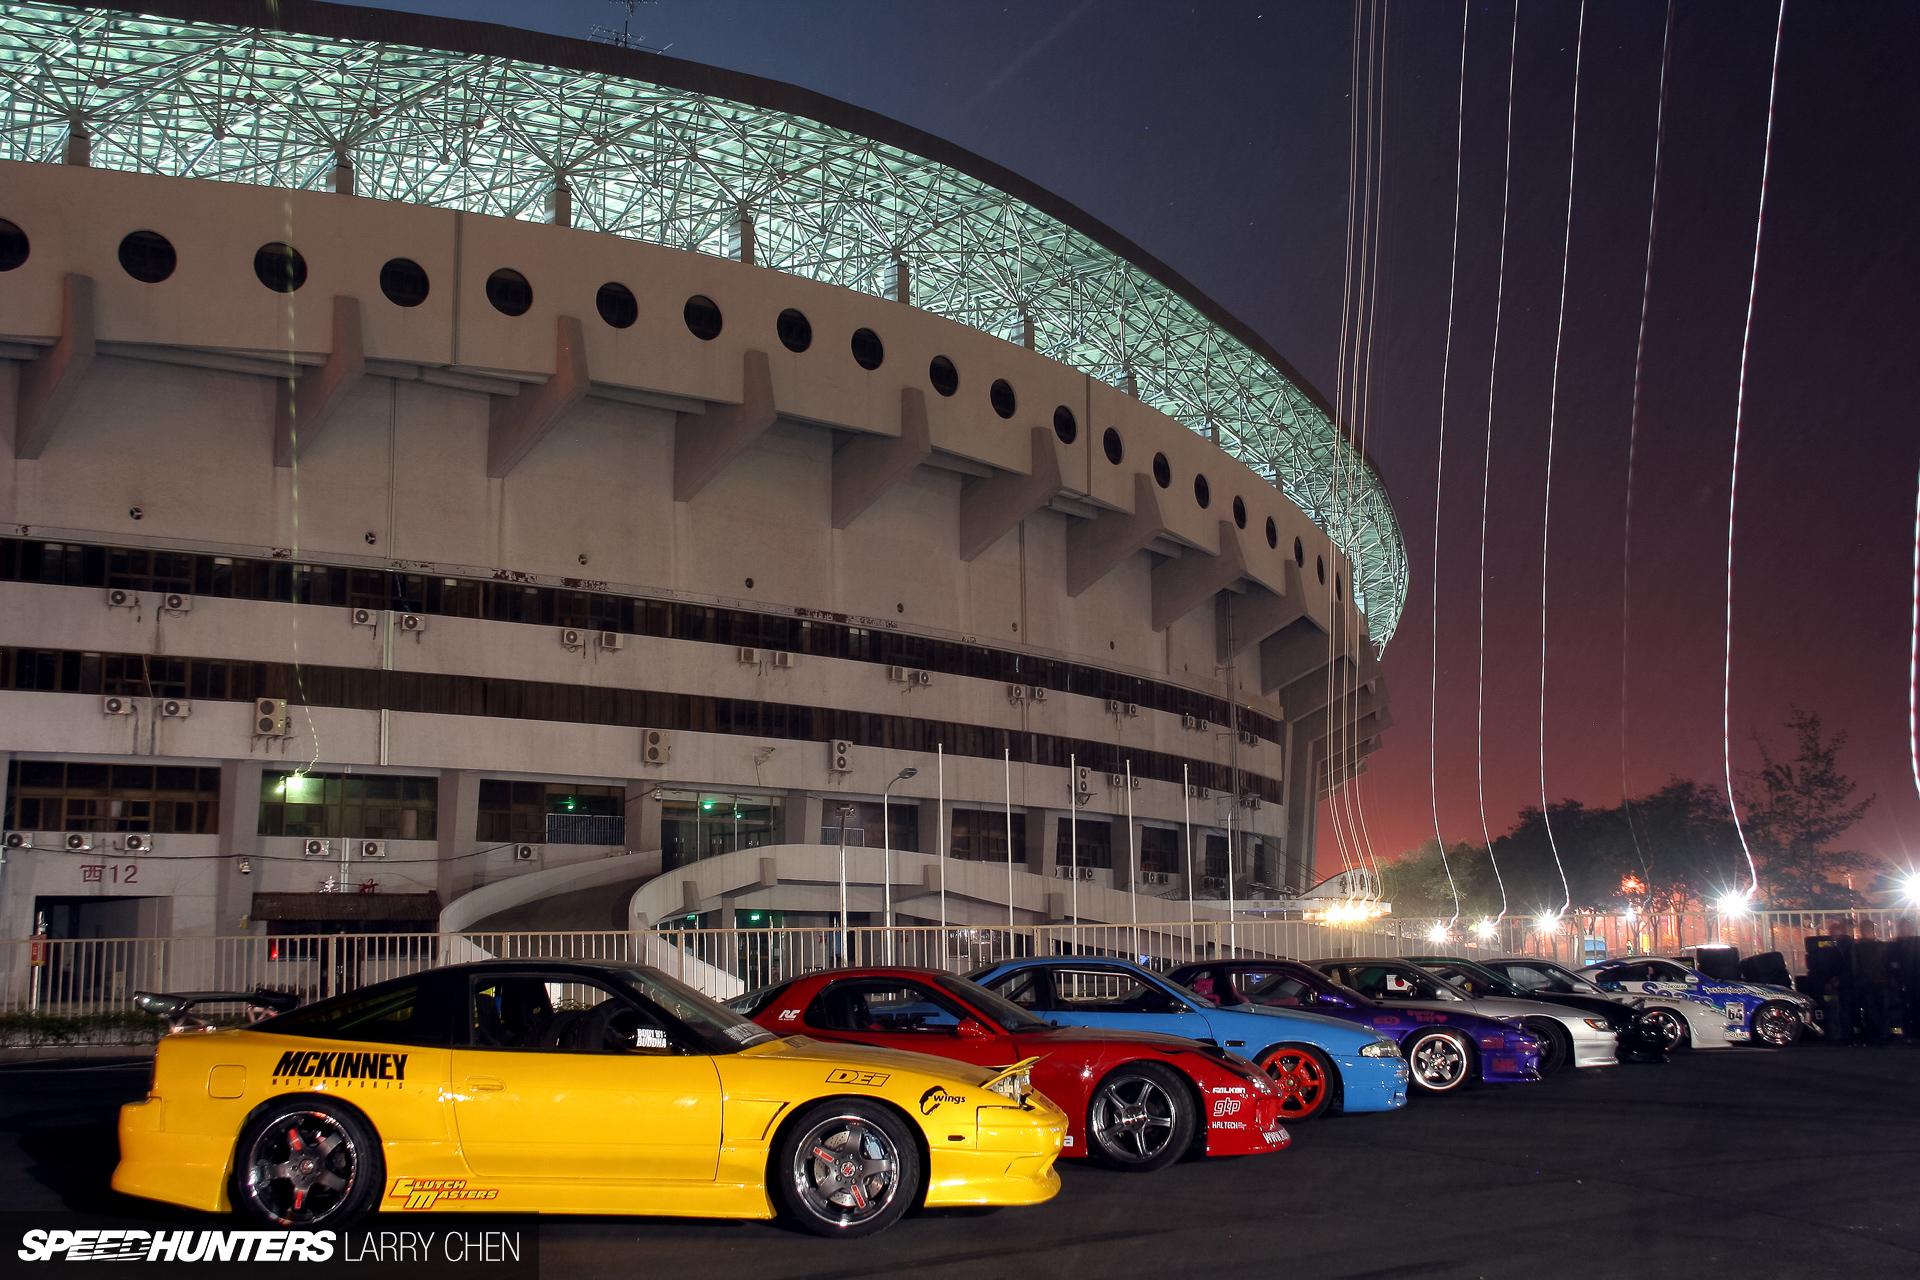 Larry_Chen_WDS_Speedhunters_retrospective_002 Inspiring Porsche 911 Gt1 Road atlanta Cars Trend